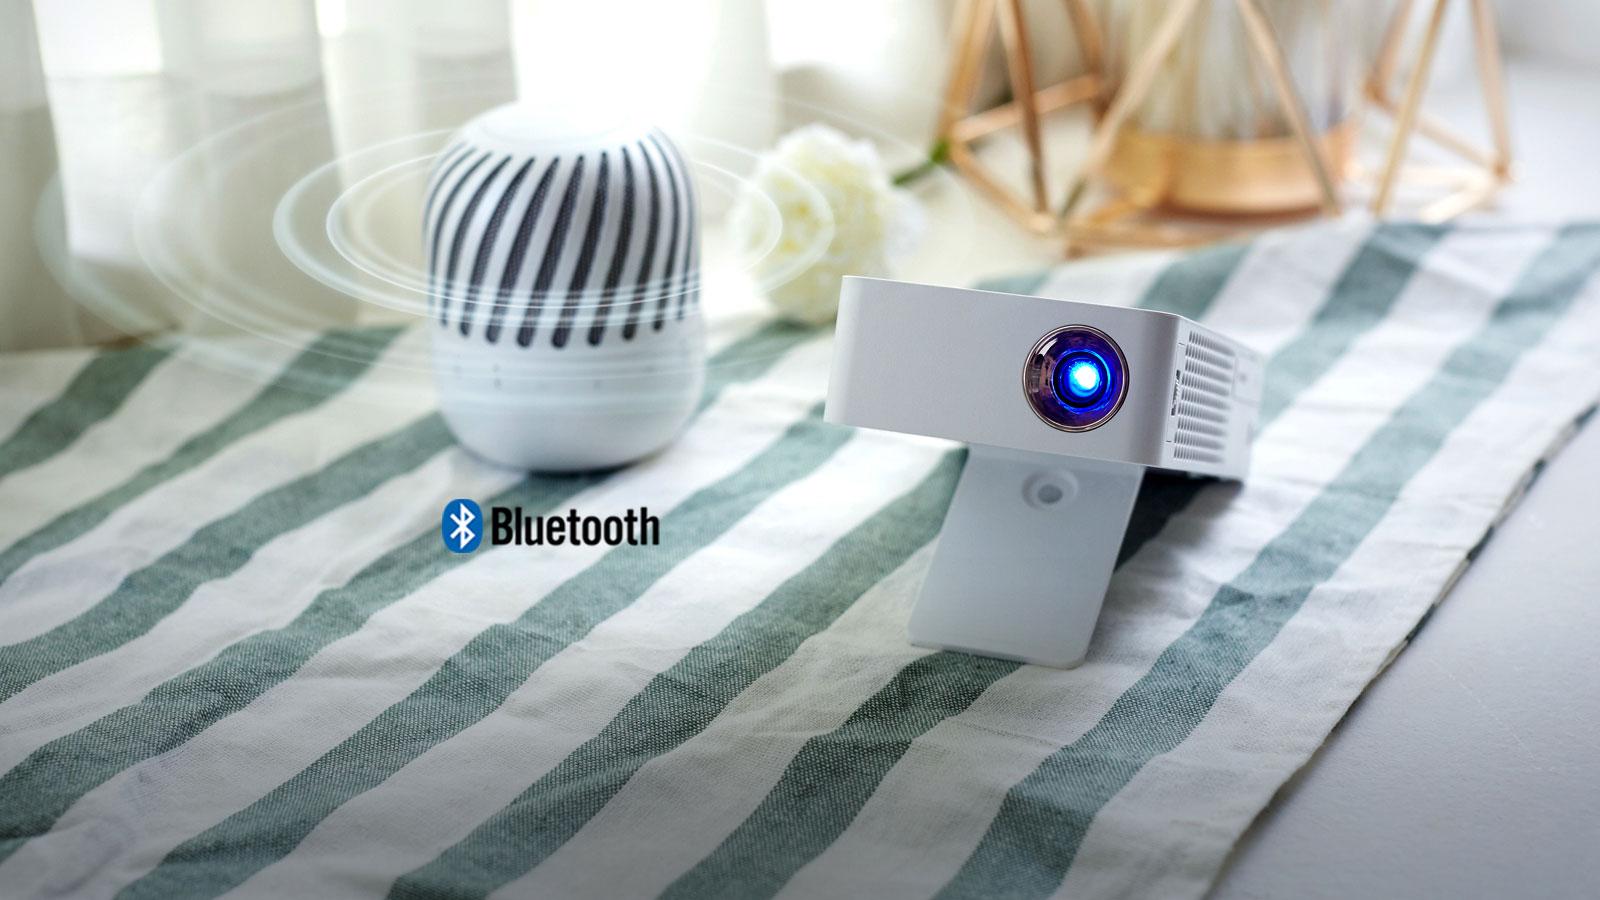 PH30JG_Bluetooth_17102017_D